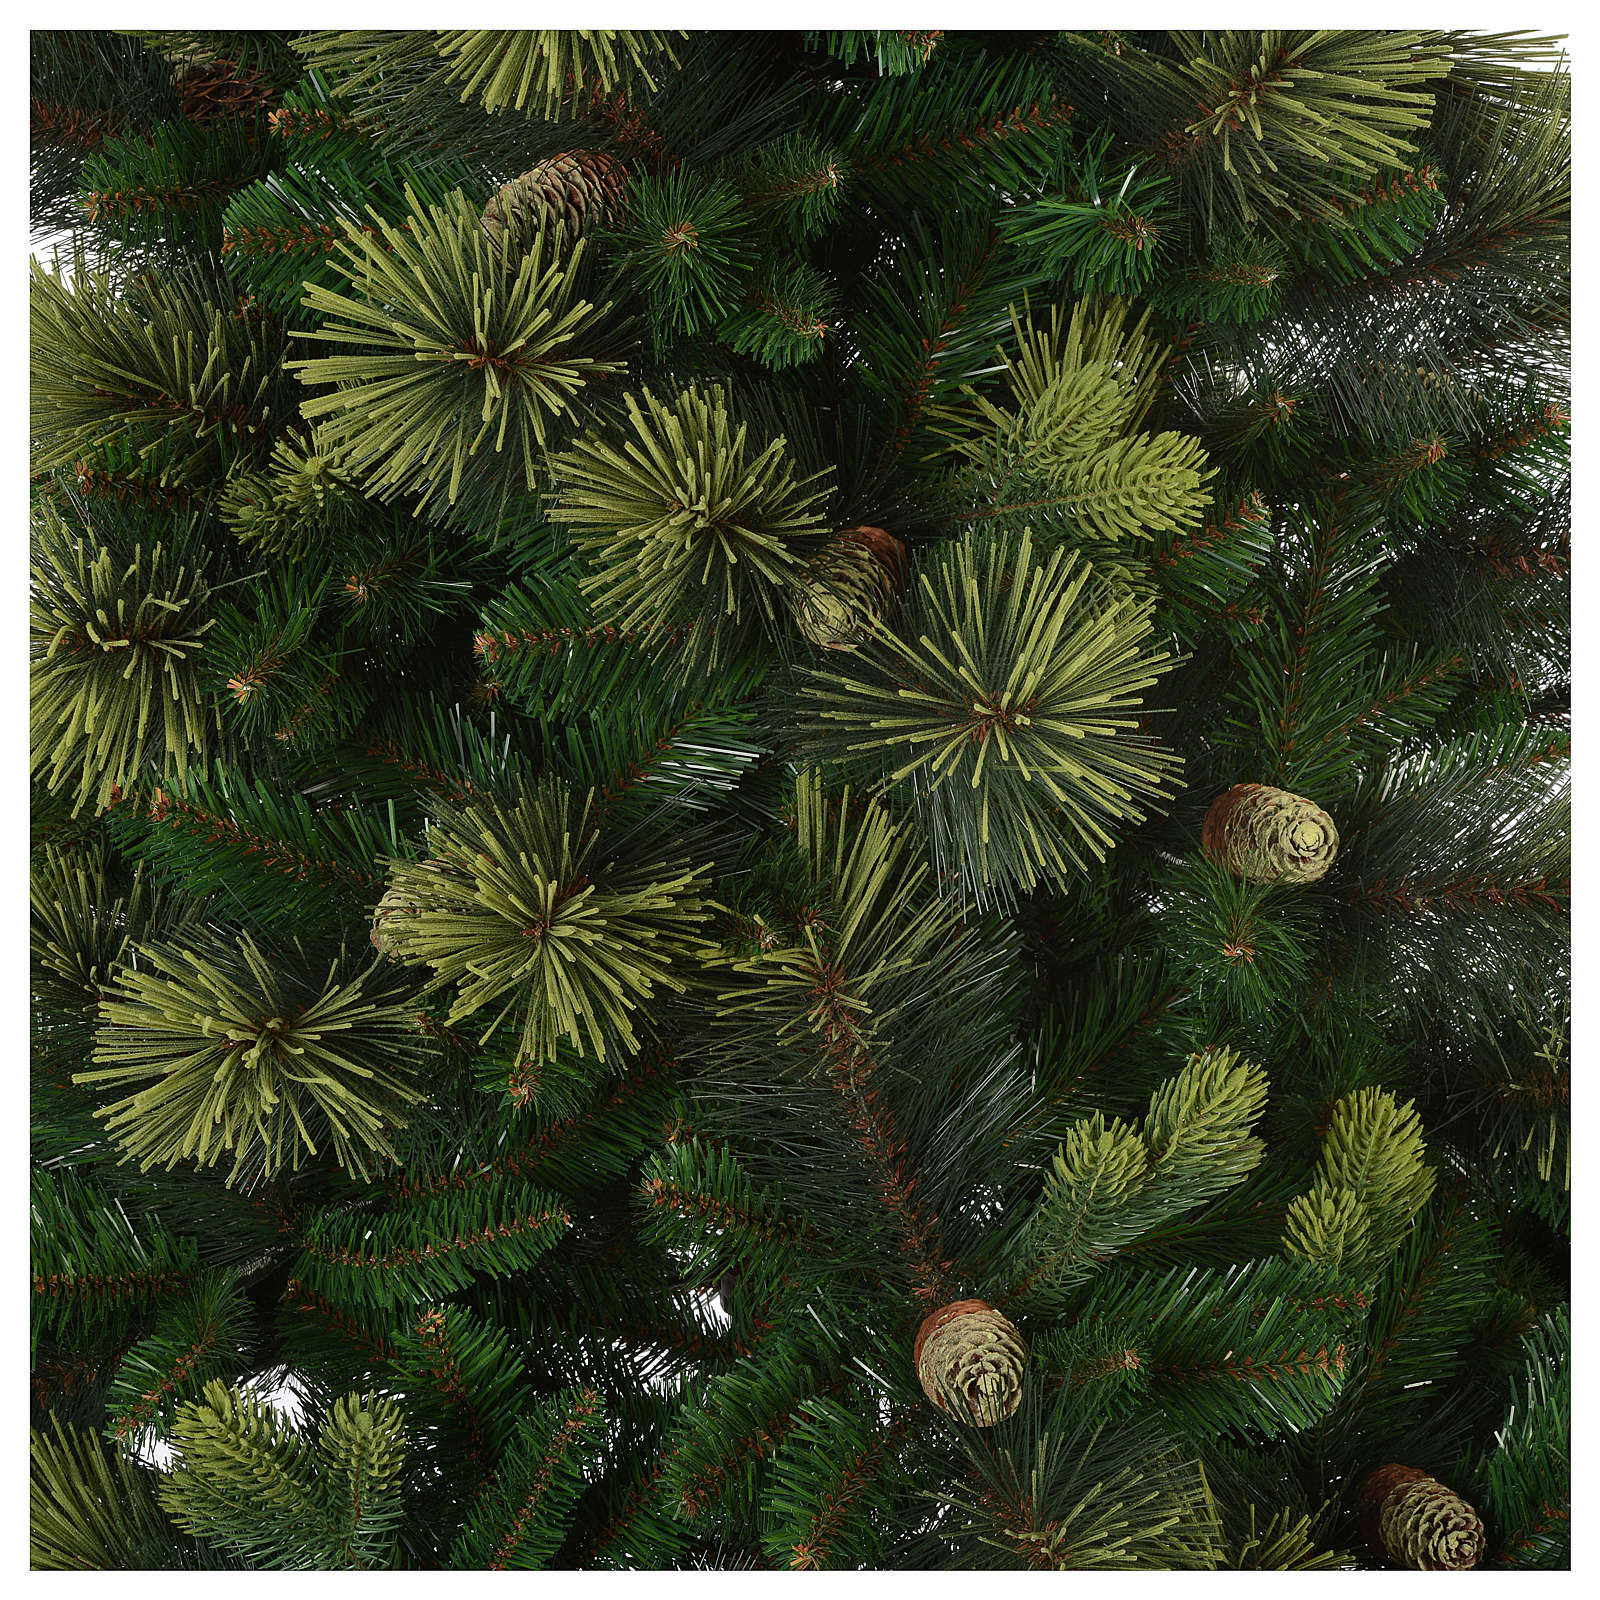 Albero di Natale 180 cm verde con pigne Carolina 3